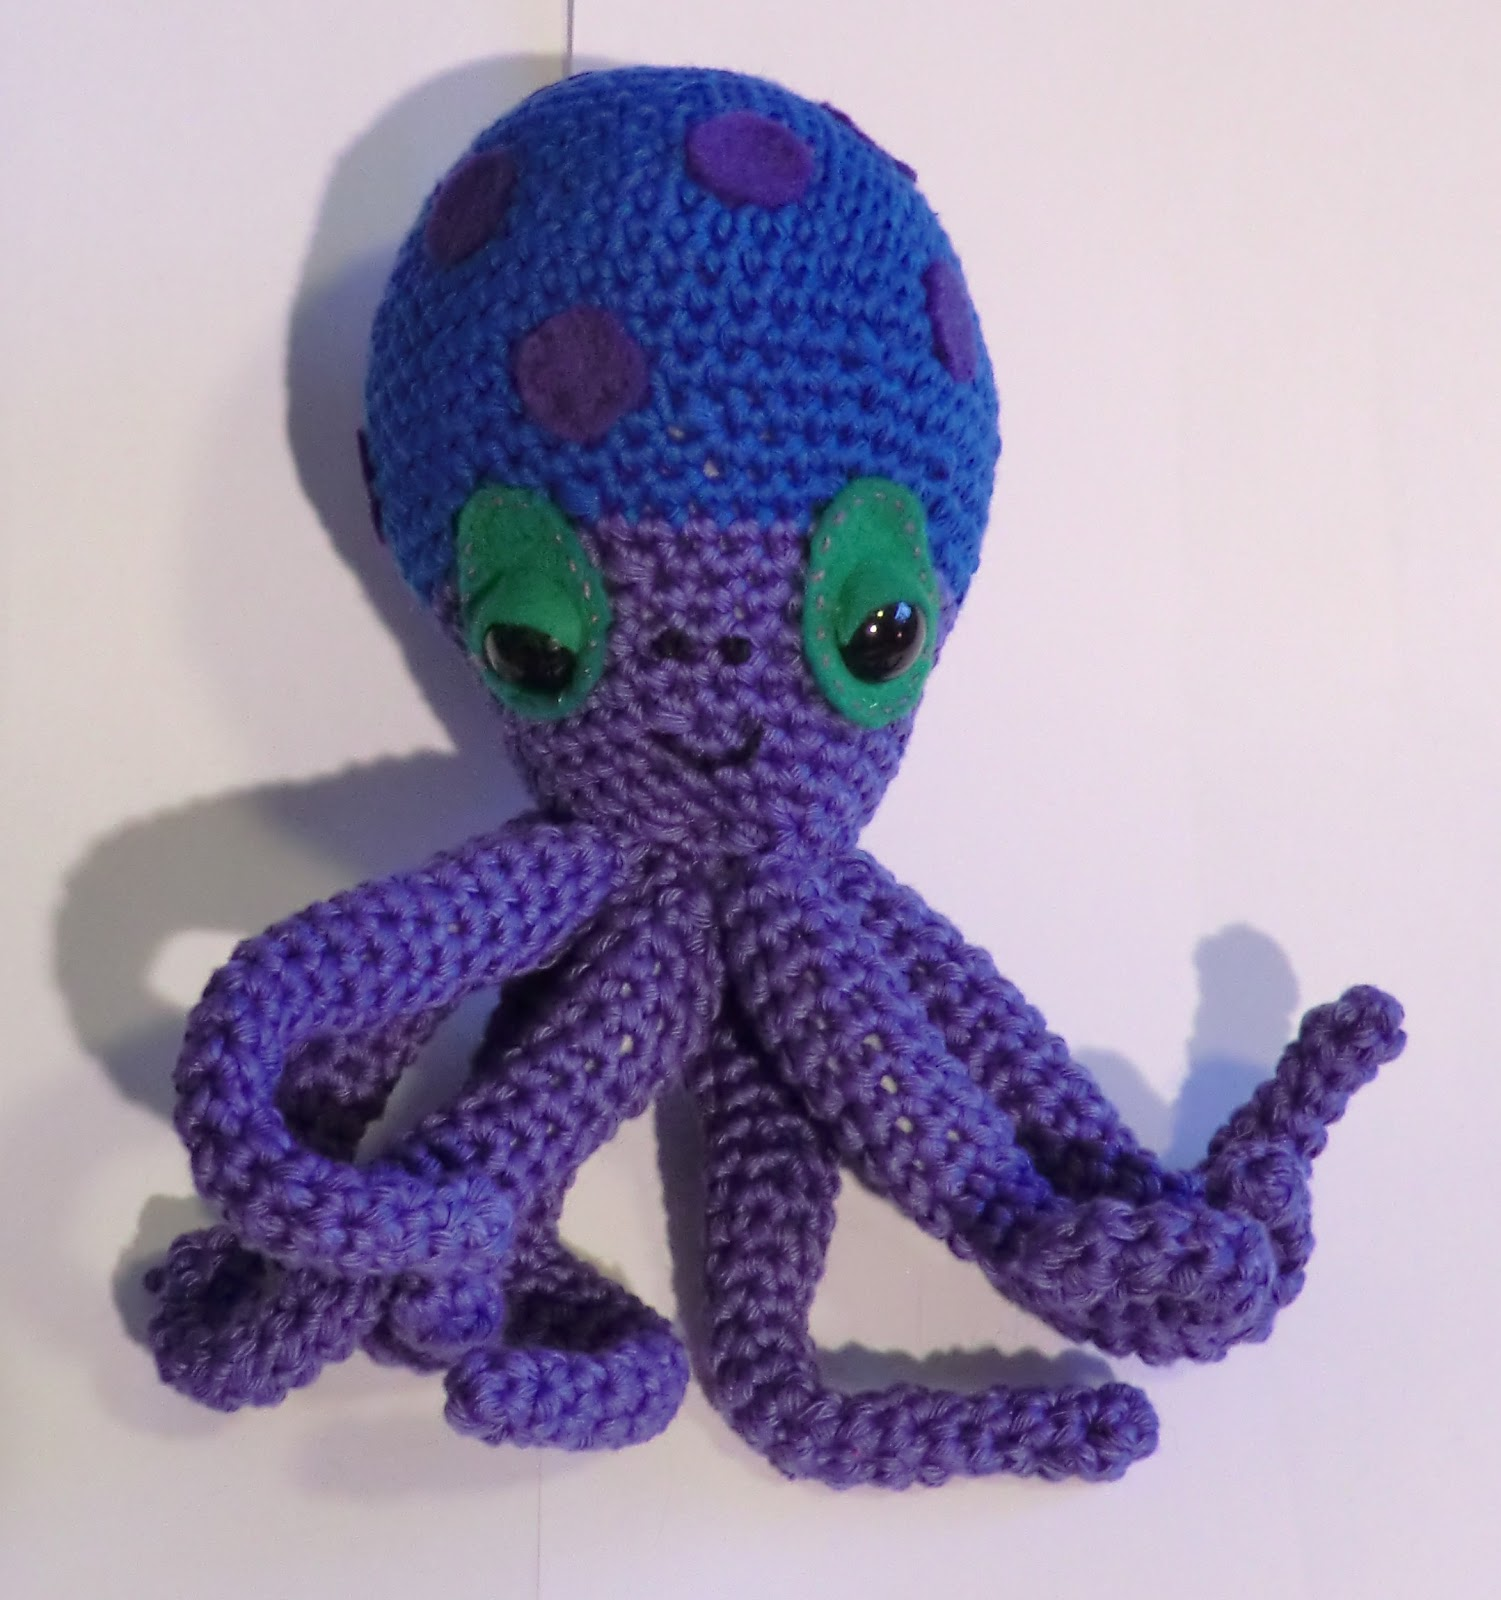 Amigurumi Octopus Anleitung : Amigurumi Barmy: Fins and flippers